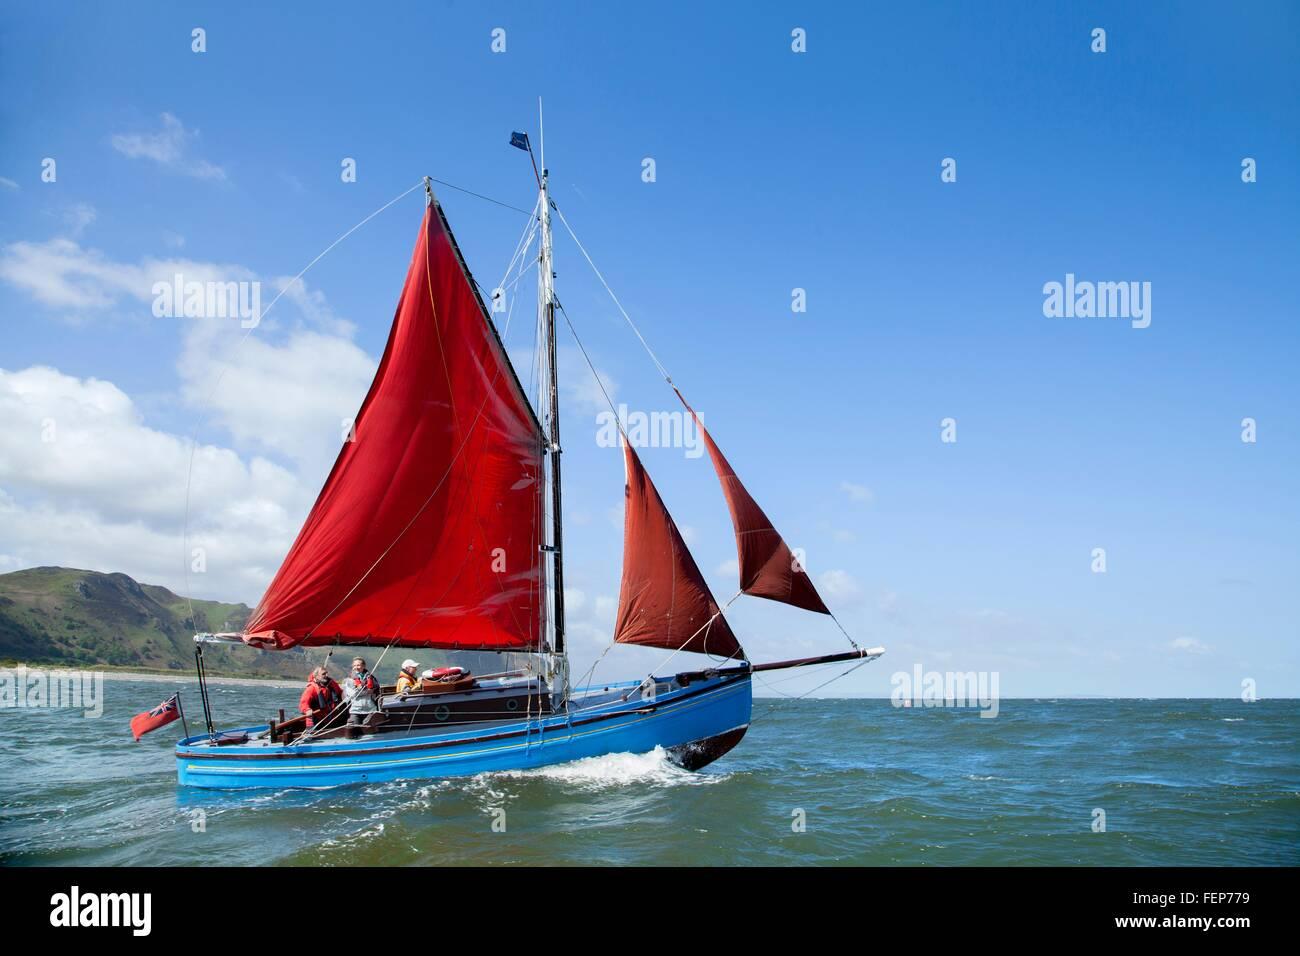 Un pequeño grupo de adultos en velero Imagen De Stock